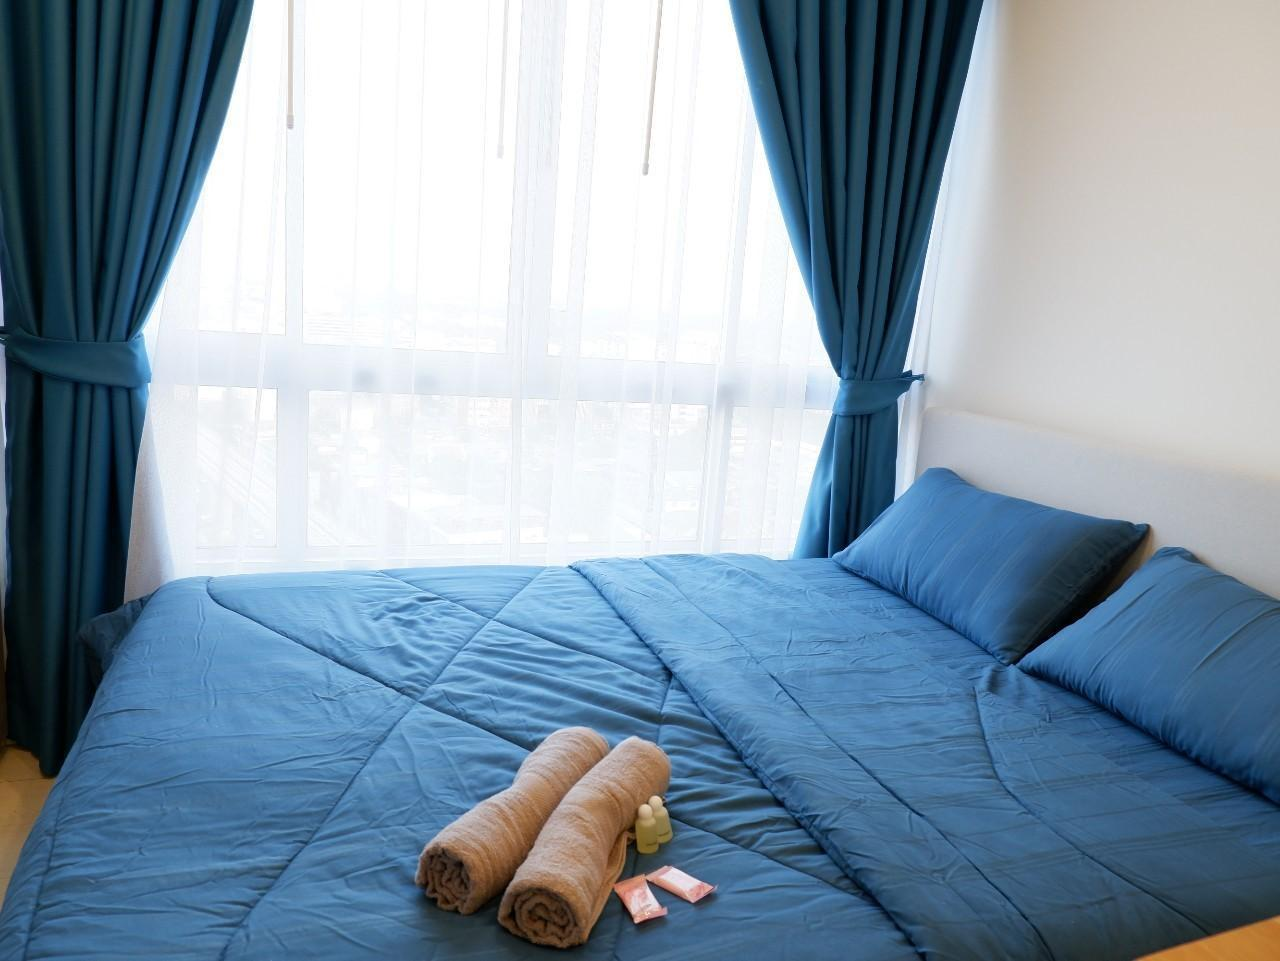 Europy CondoTels อพาร์ตเมนต์ 1 ห้องนอน 1 ห้องน้ำส่วนตัว ขนาด 28 ตร.ม. – ธนบุรี